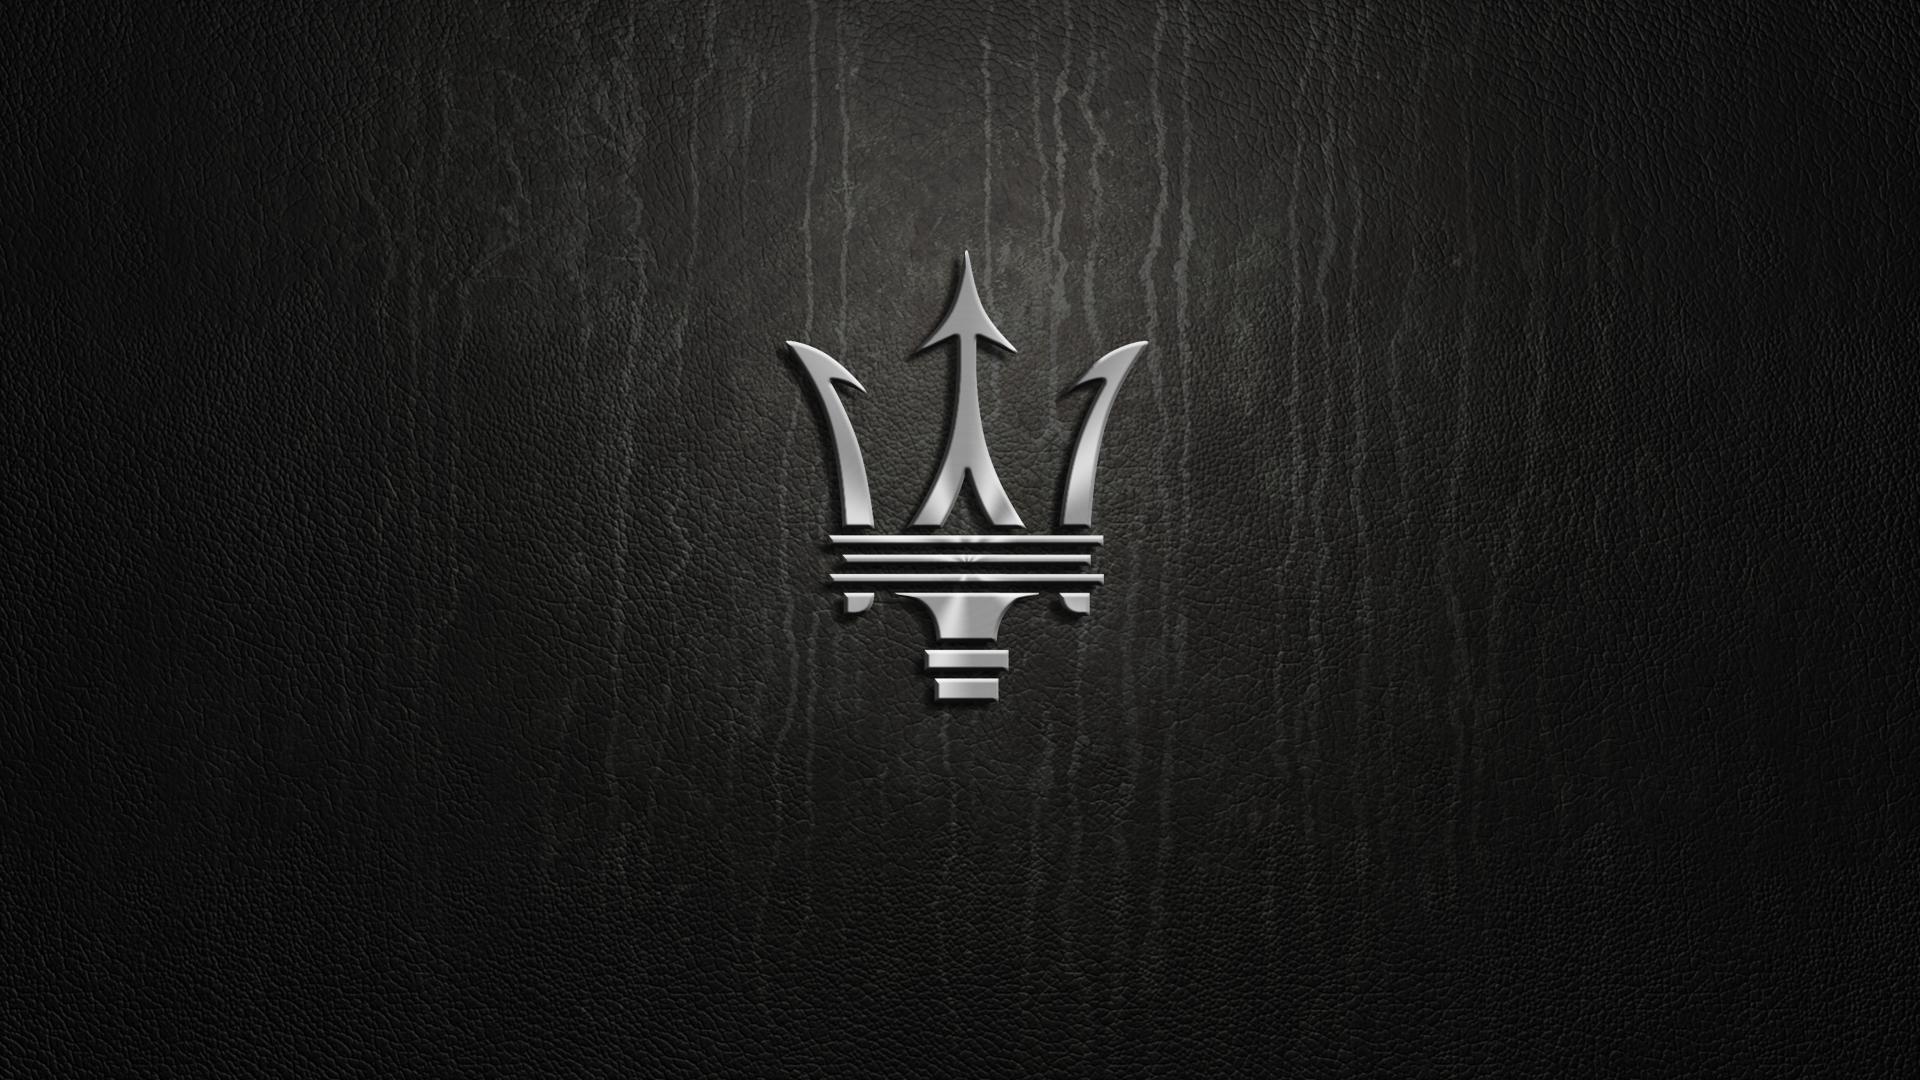 silver logo on black background Logo wallpaper hd Maserati 1920x1080